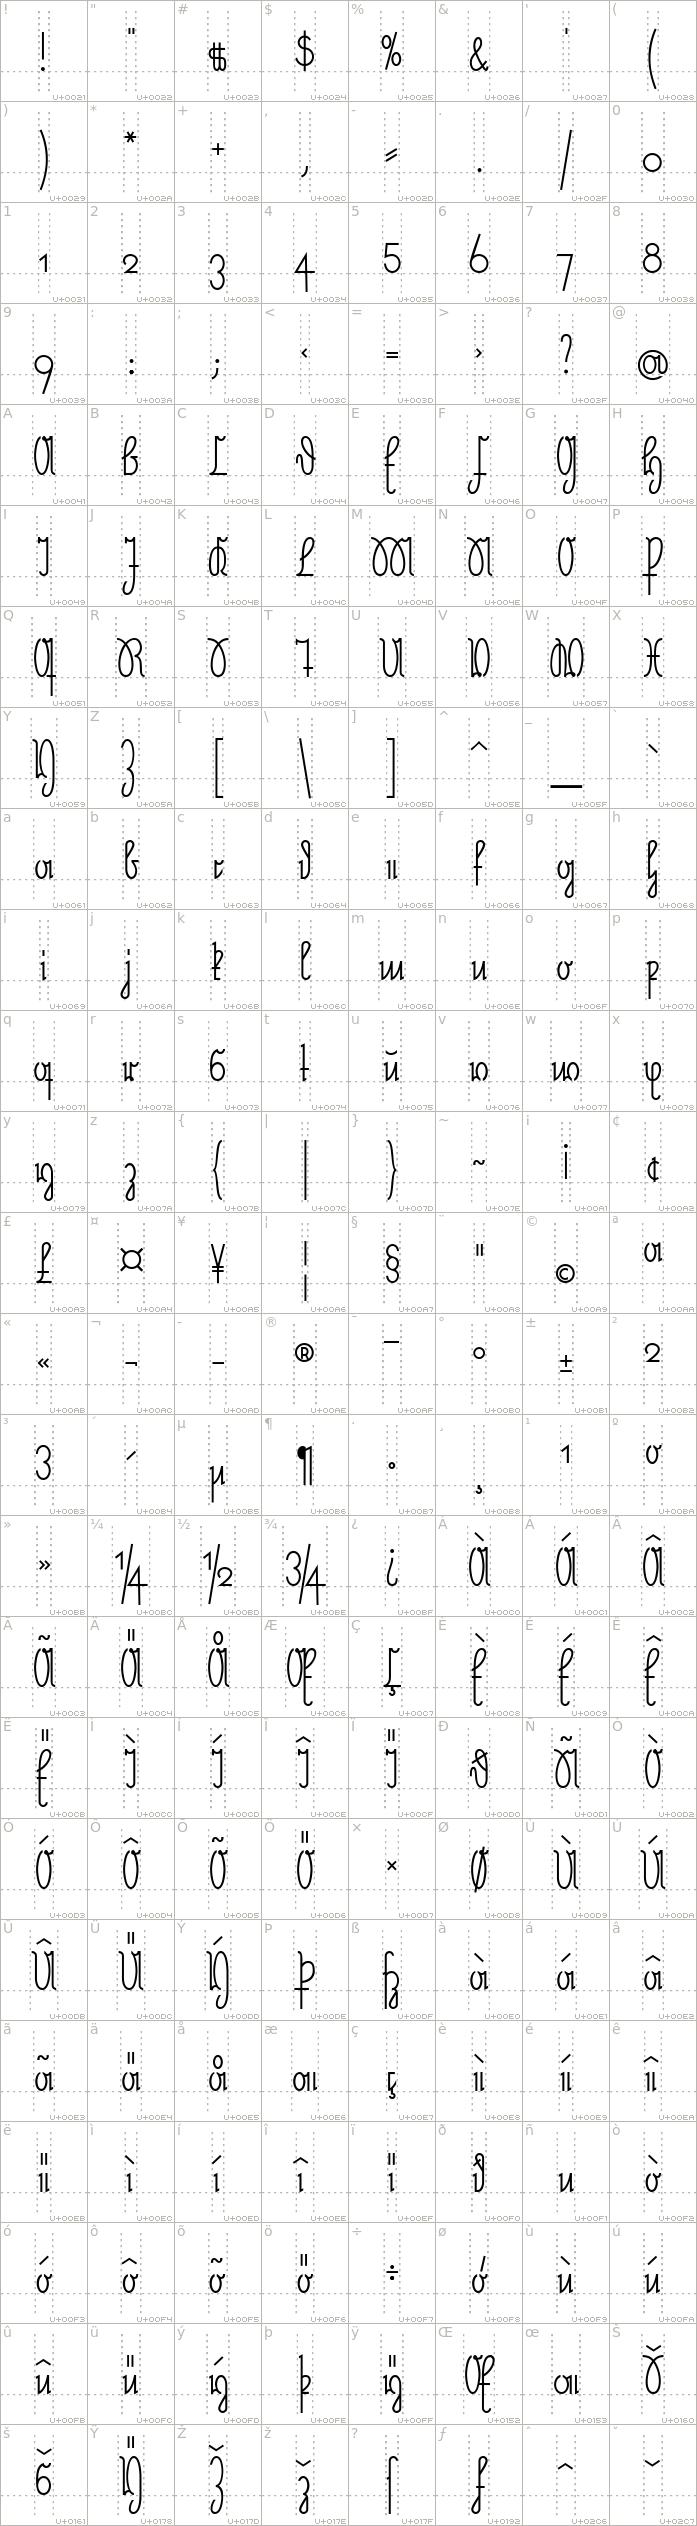 neue-rudelskopf.rudelskopf.character-map-1